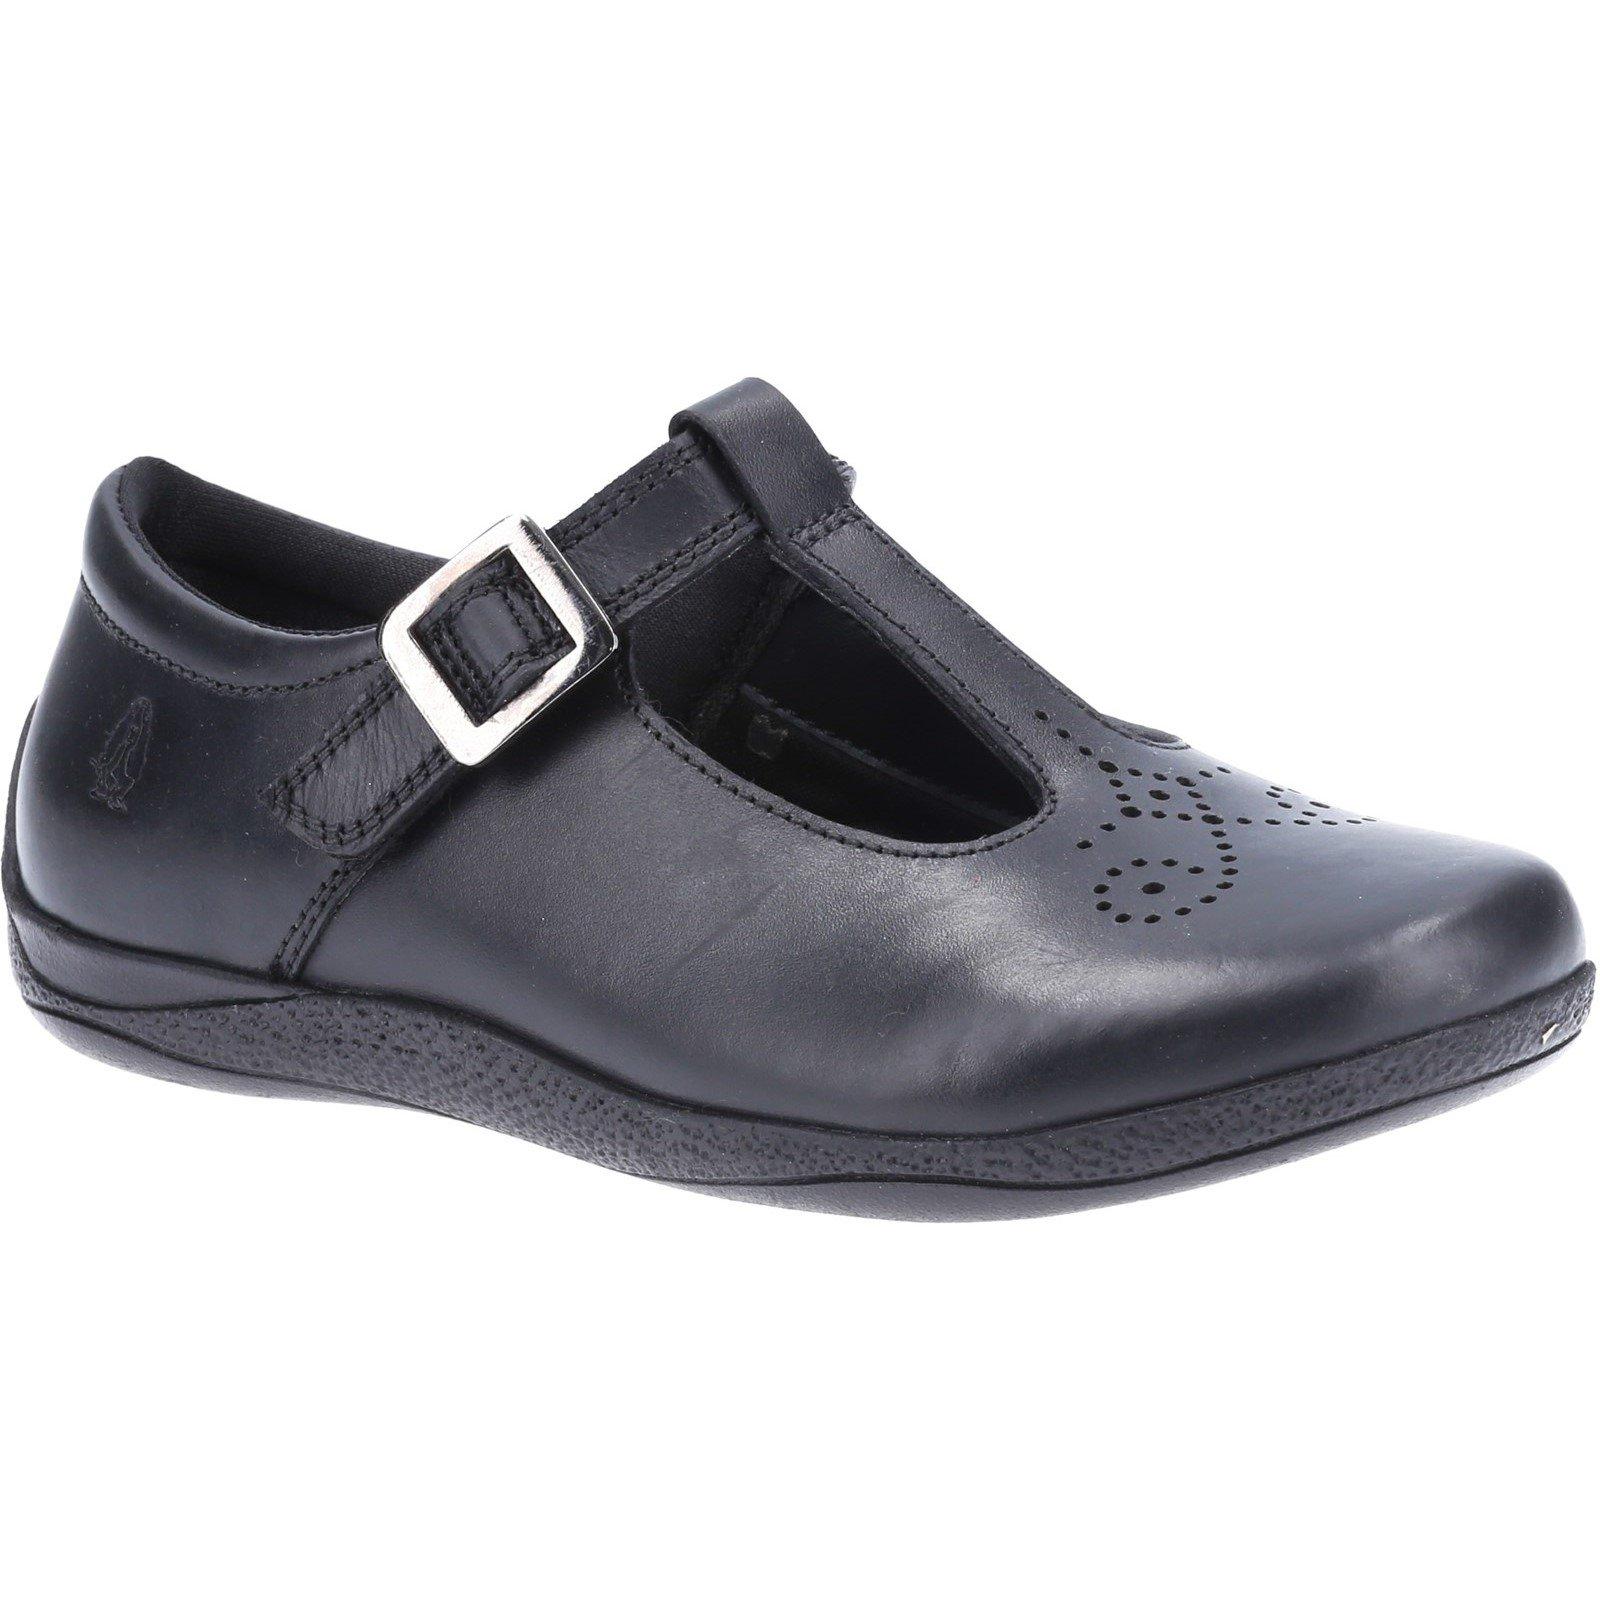 Hush Puppies Kid's Eliza Senior School Shoe Black 32590 - Black 4